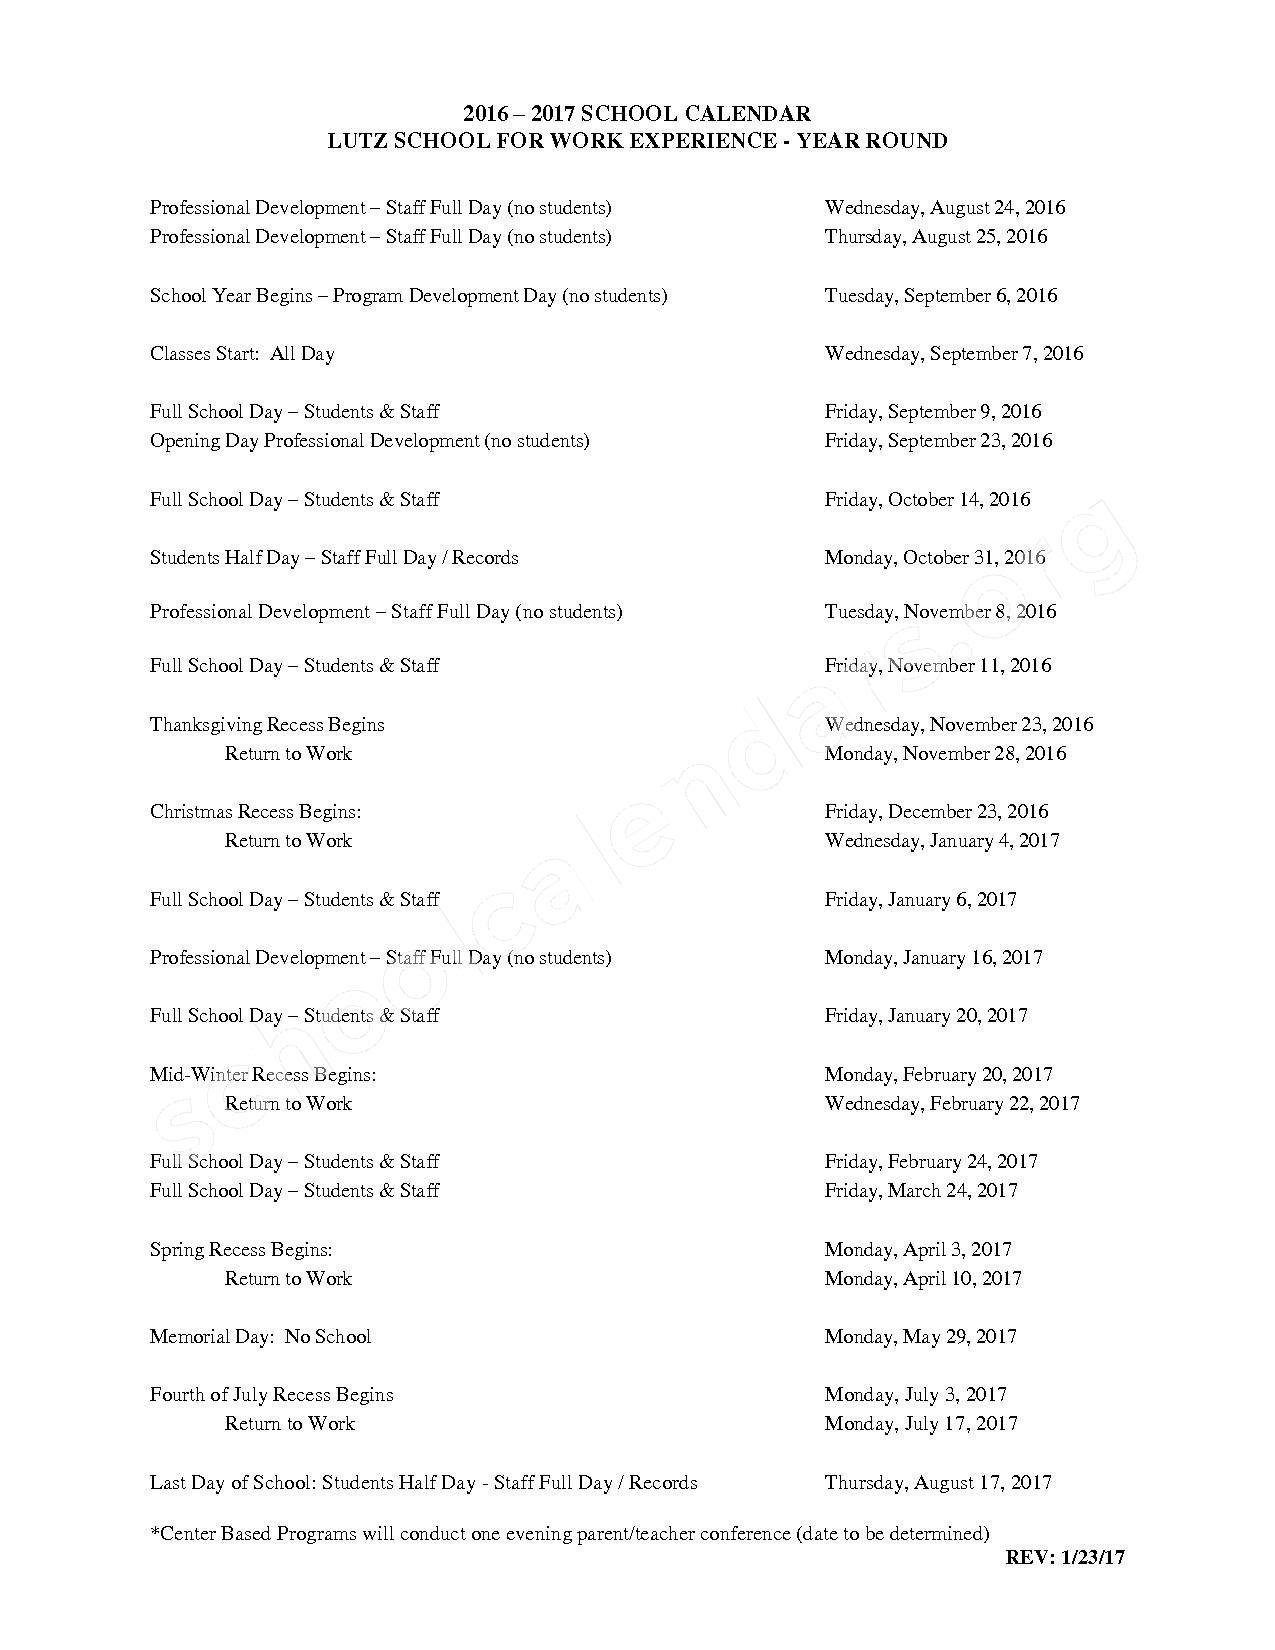 2016 - 2017 School Calendars – Roseville Community Schools – page 1